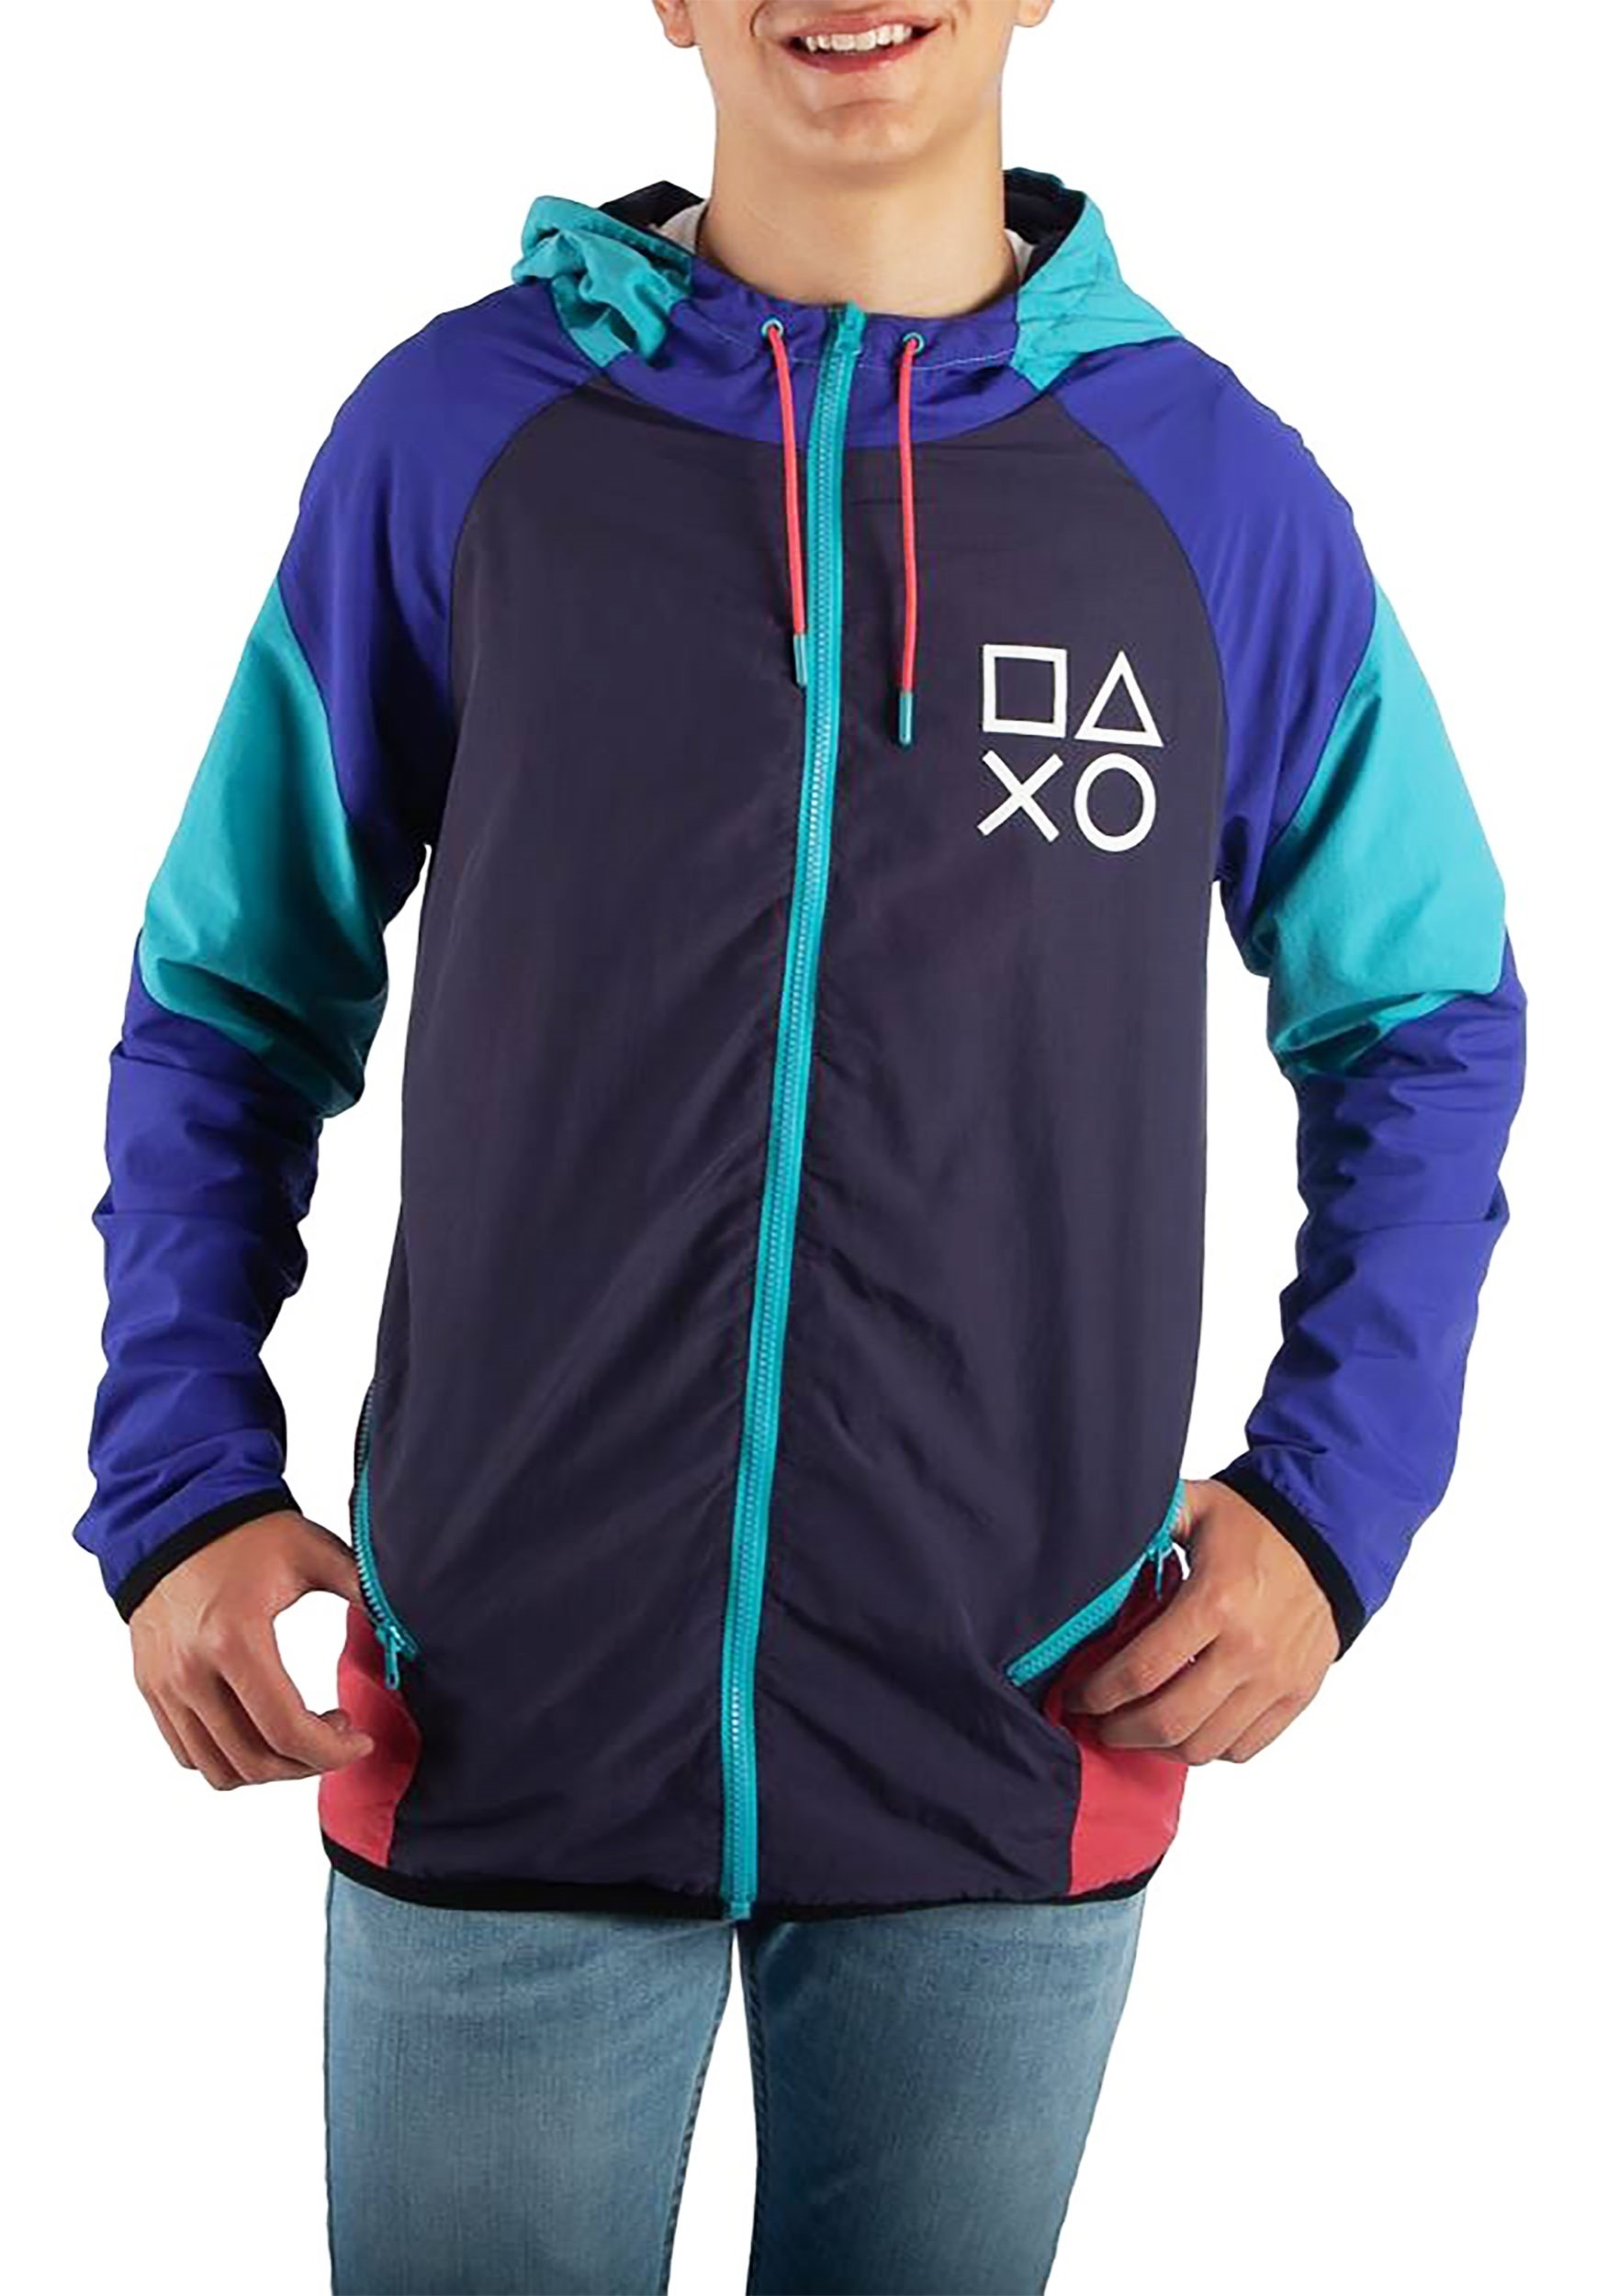 PlayStation Color Block Adult Windbreaker Jacket 21c575f23